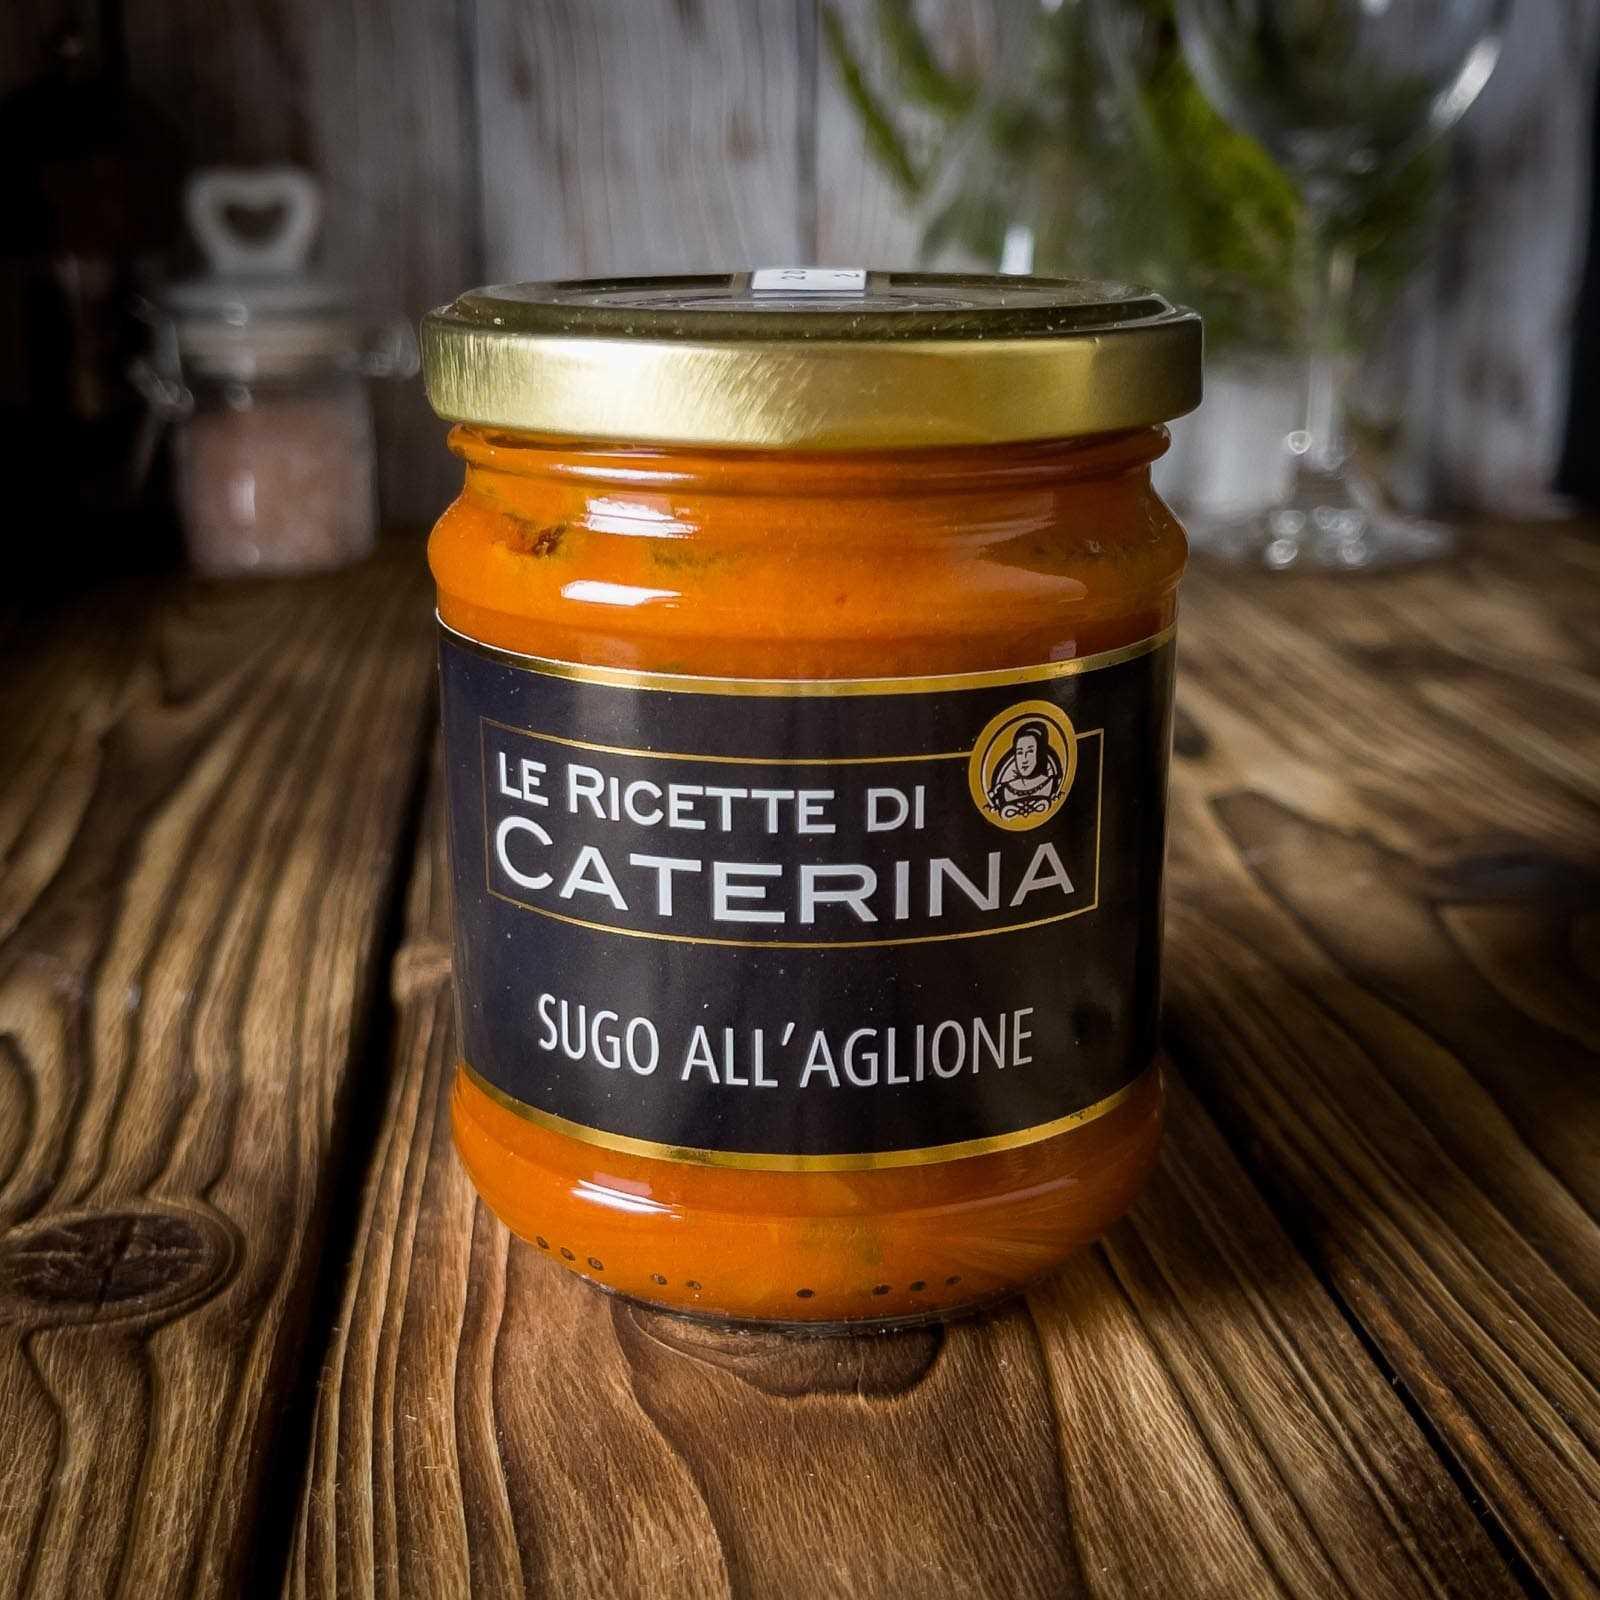 Pasta sauce with tomato and garlic, the typical garlic of the Valdichiana.